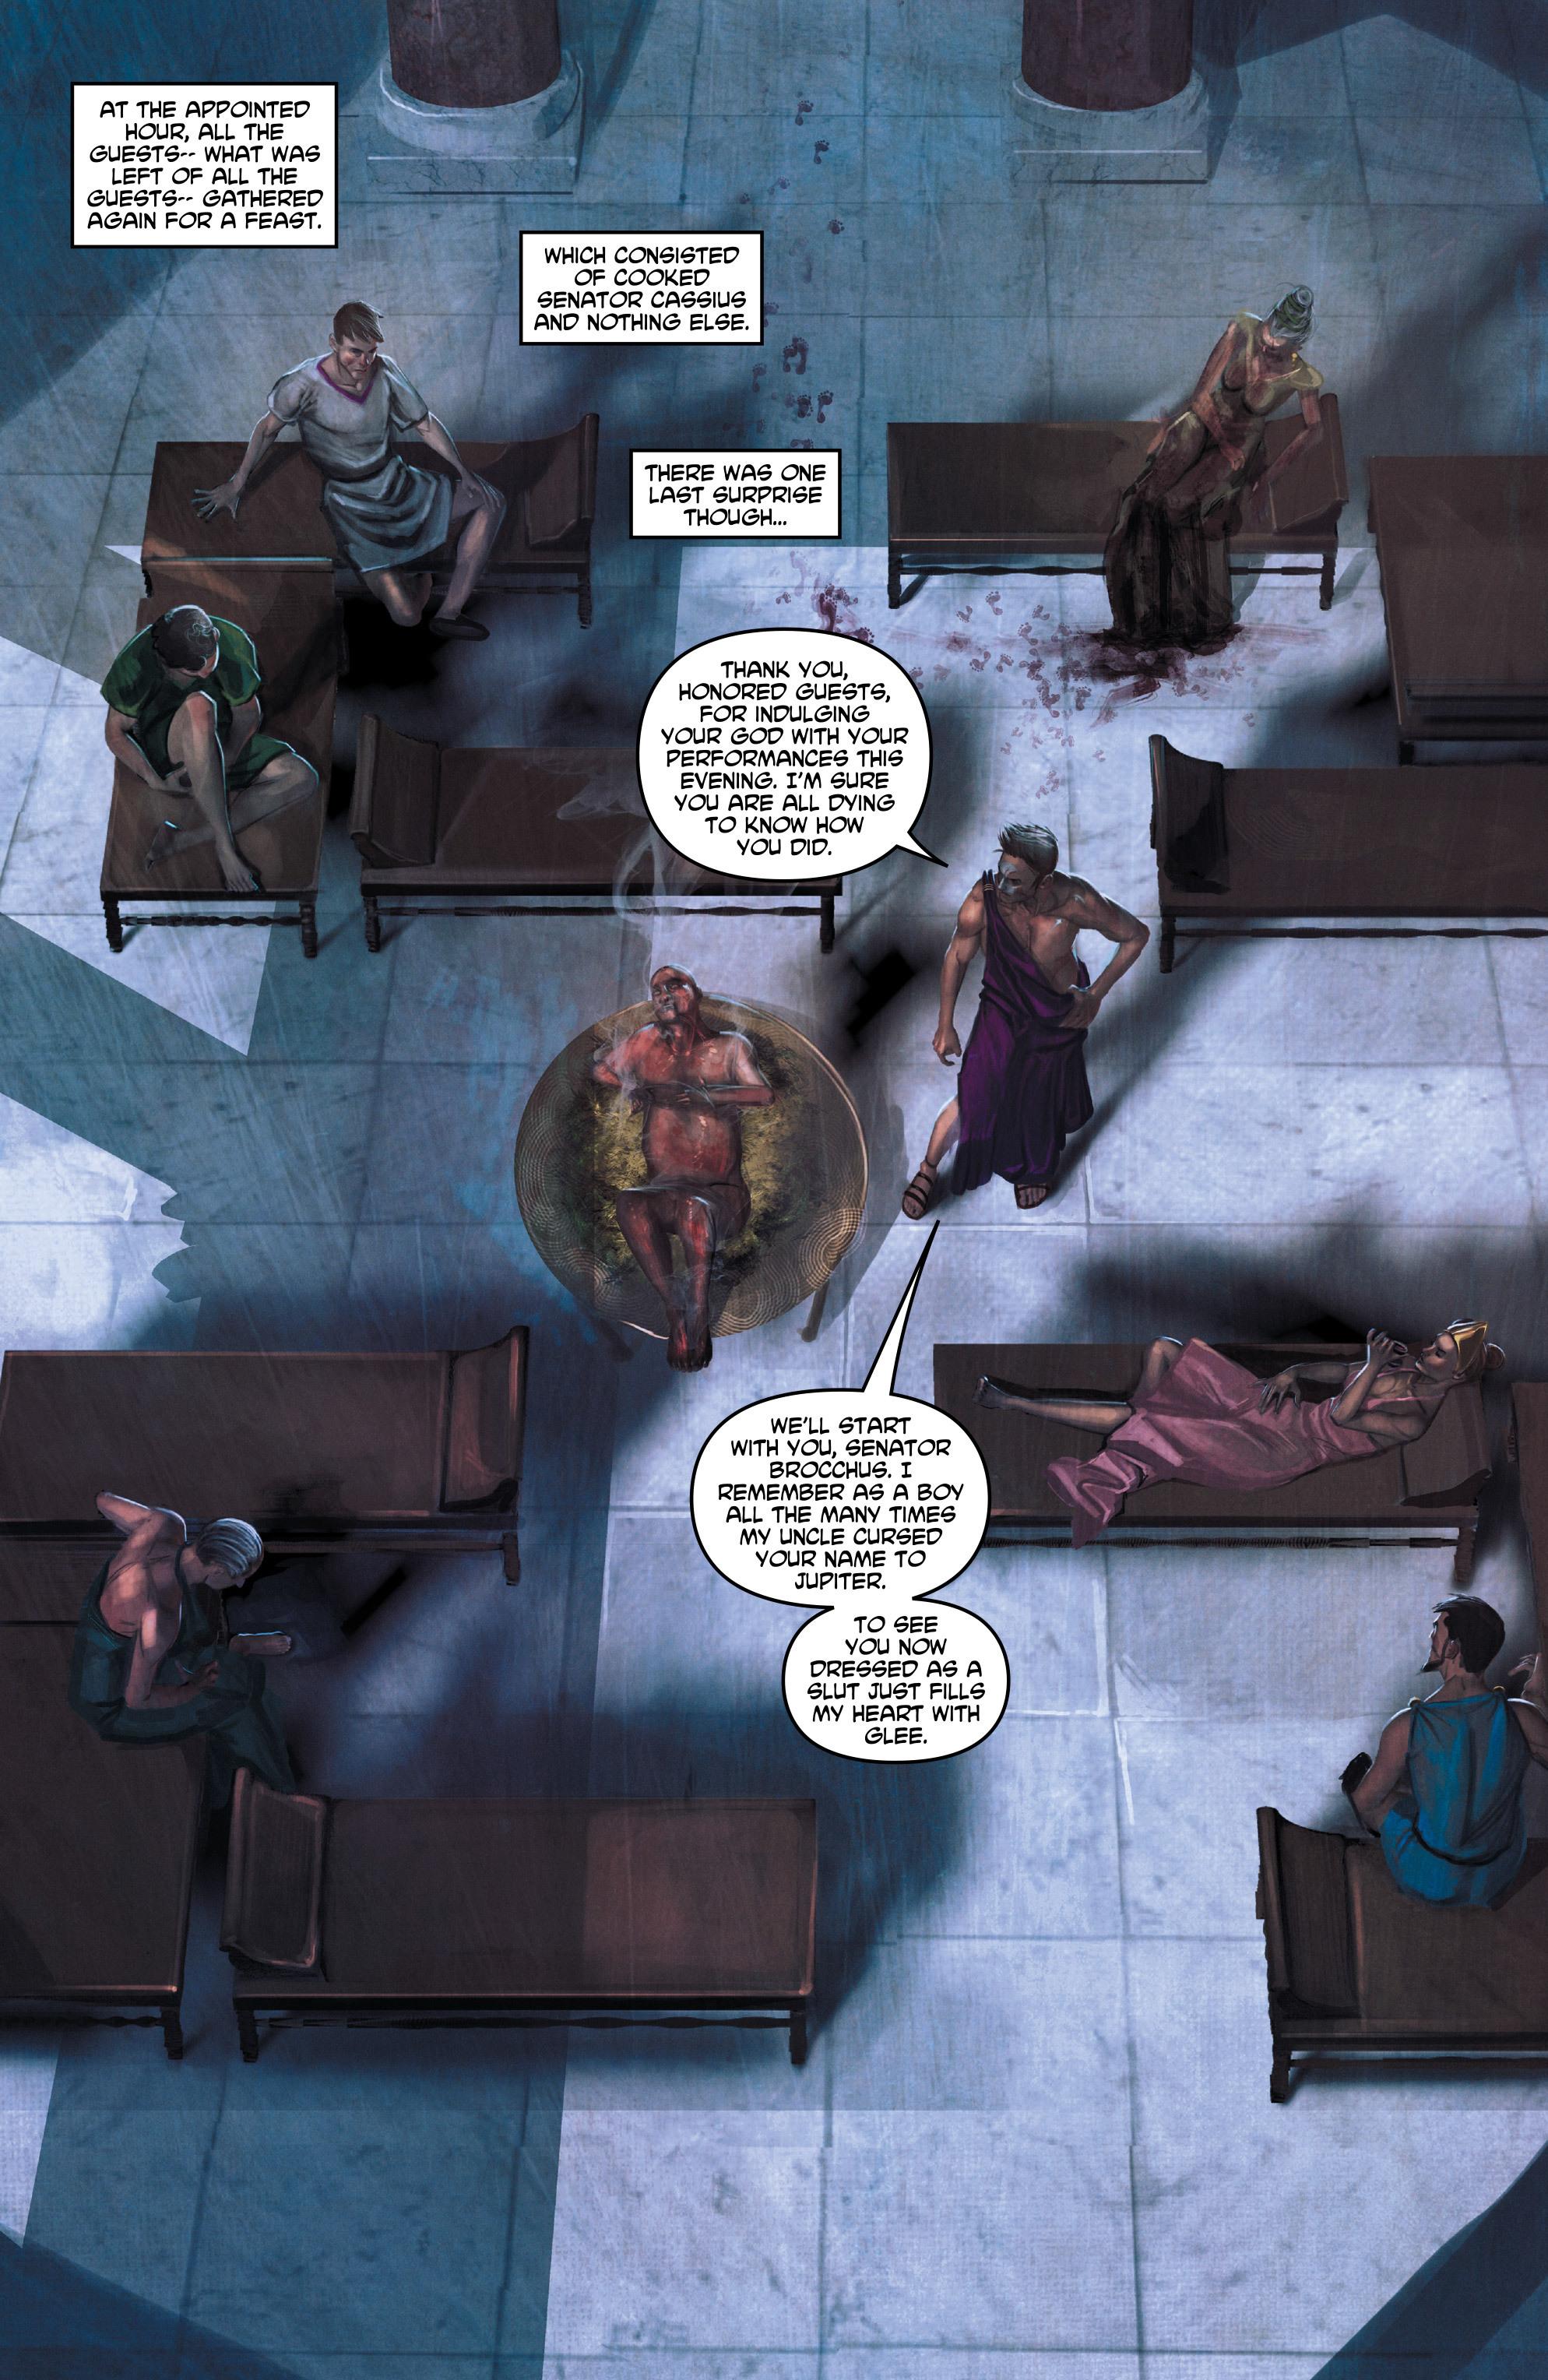 Caligula Issue 4   Read Caligula Issue 4 comic online in